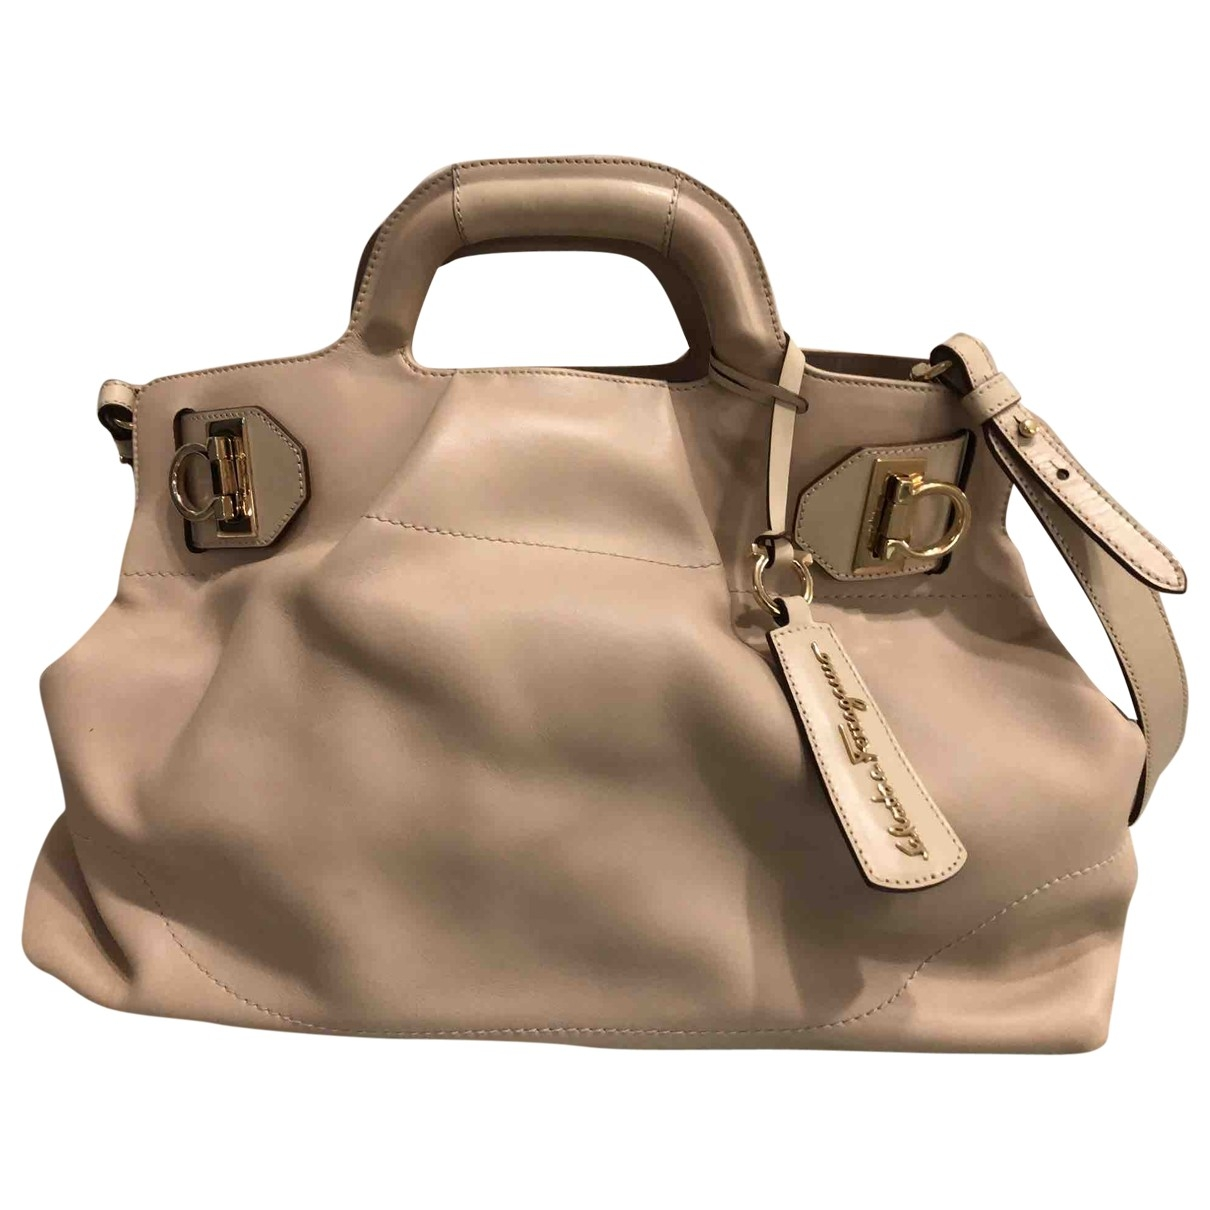 Salvatore Ferragamo \N Ecru Leather handbag for Women \N